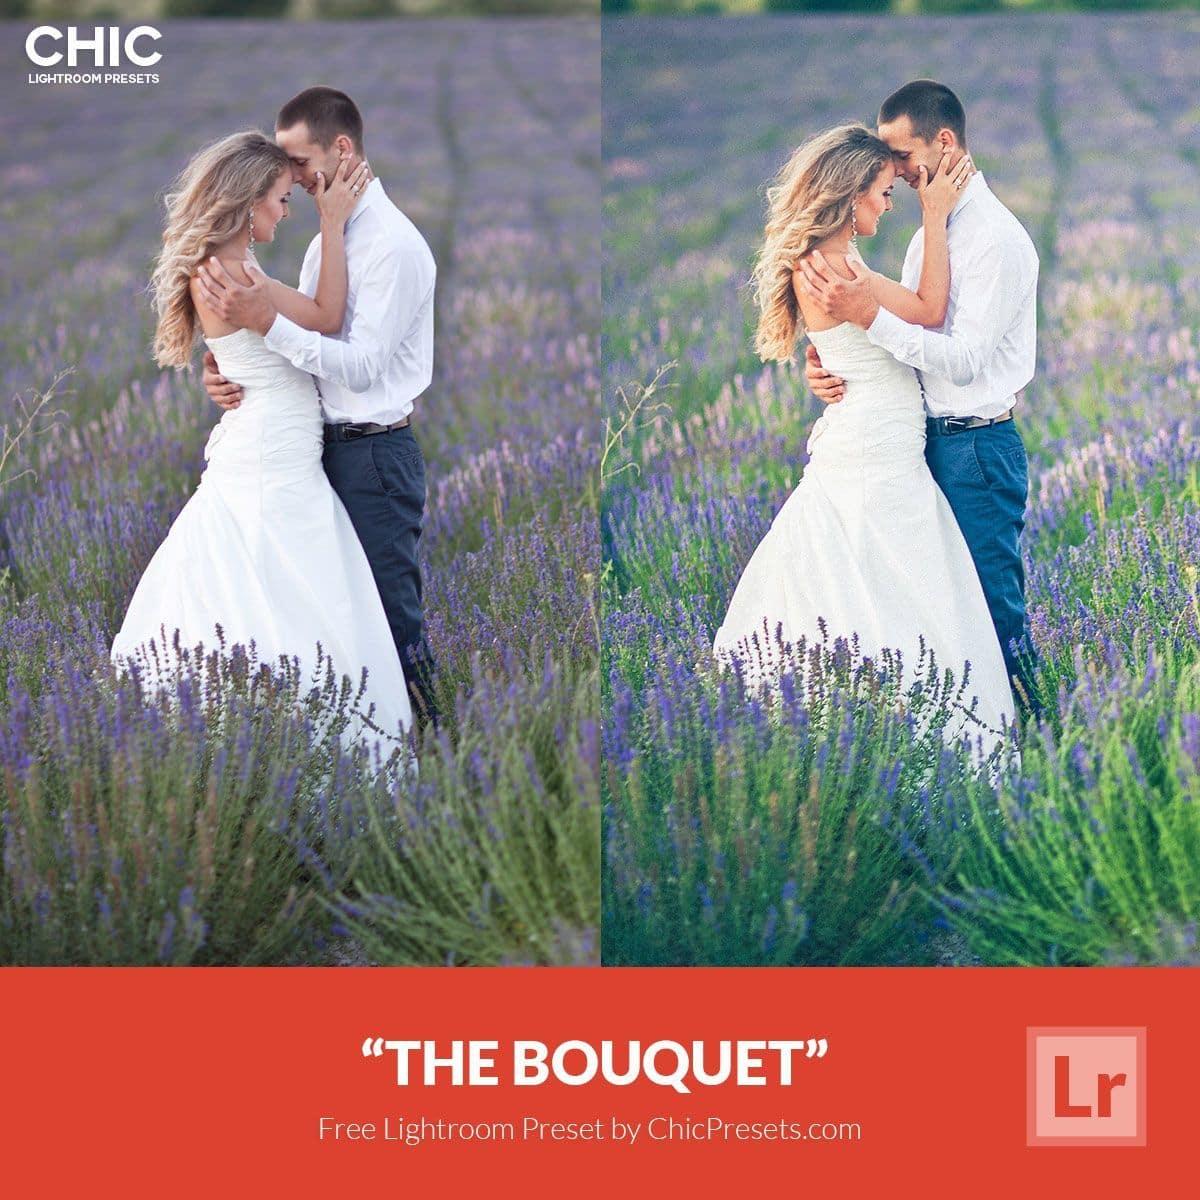 Free-Lightroom-Preset-The-Bouquet